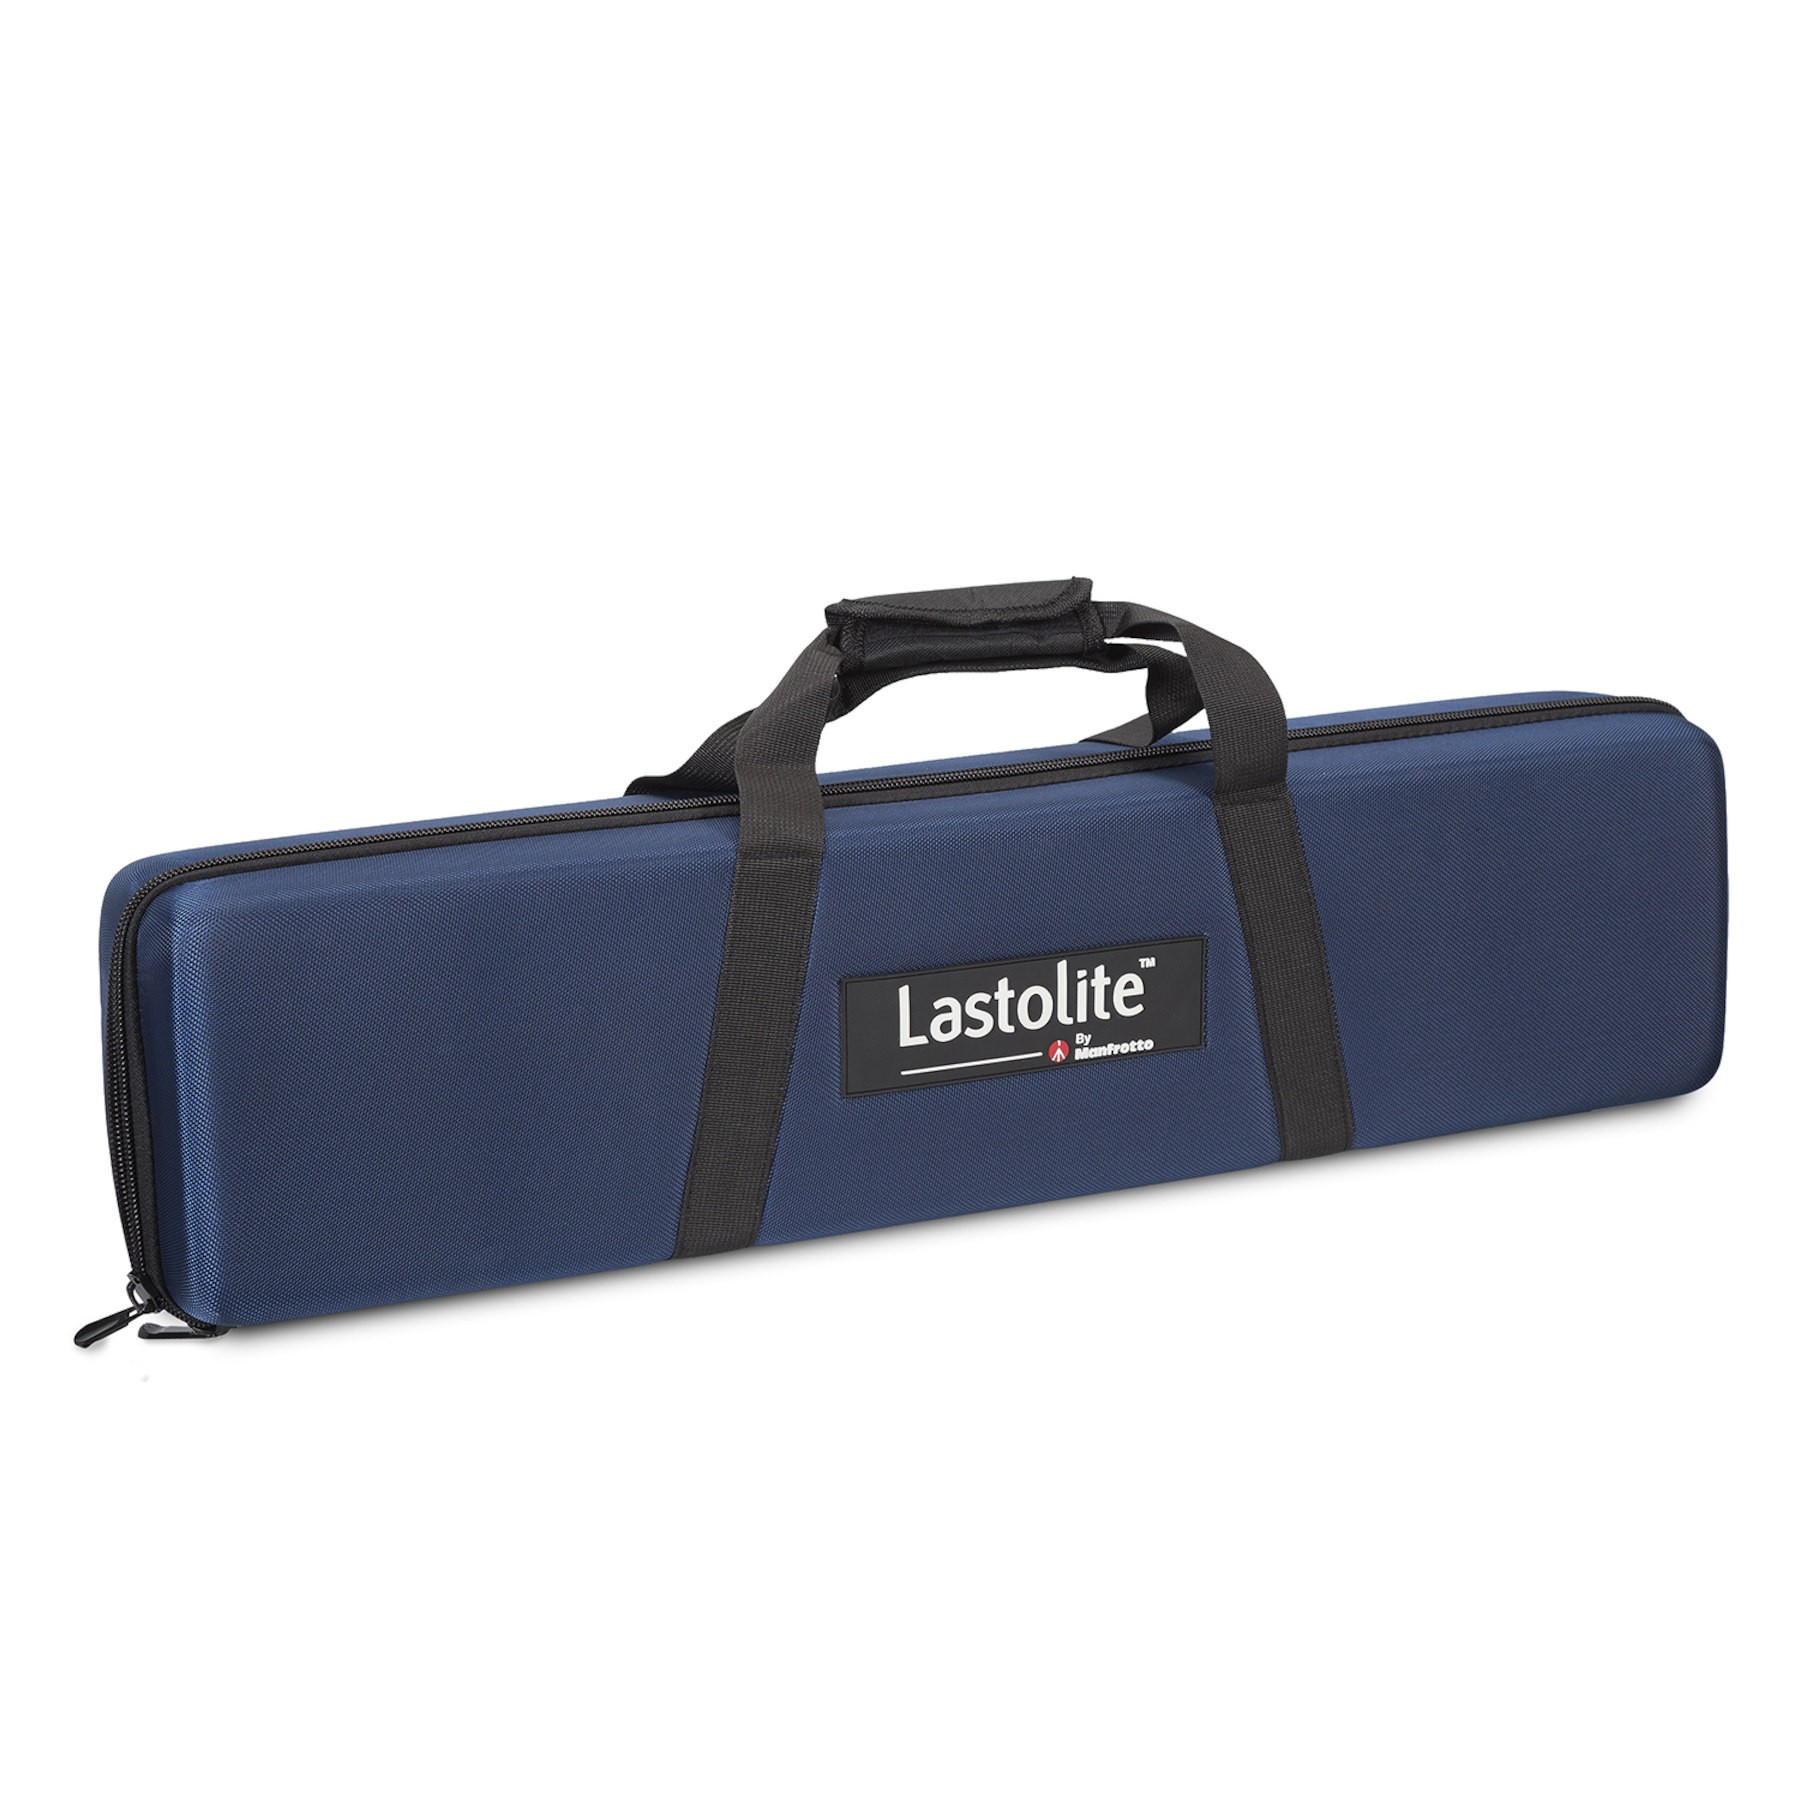 Lastolite SkyRapid Midi Kit 1,5 x 1,5m